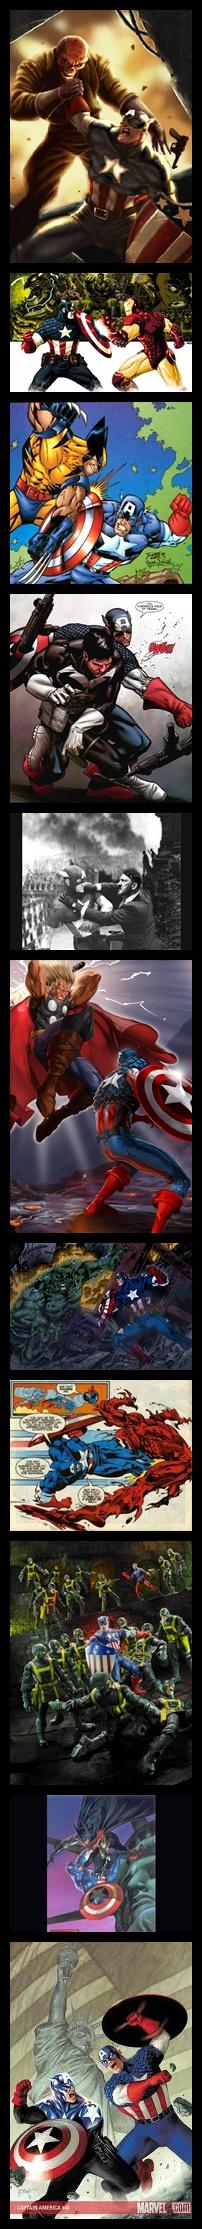 Captain America Vs All